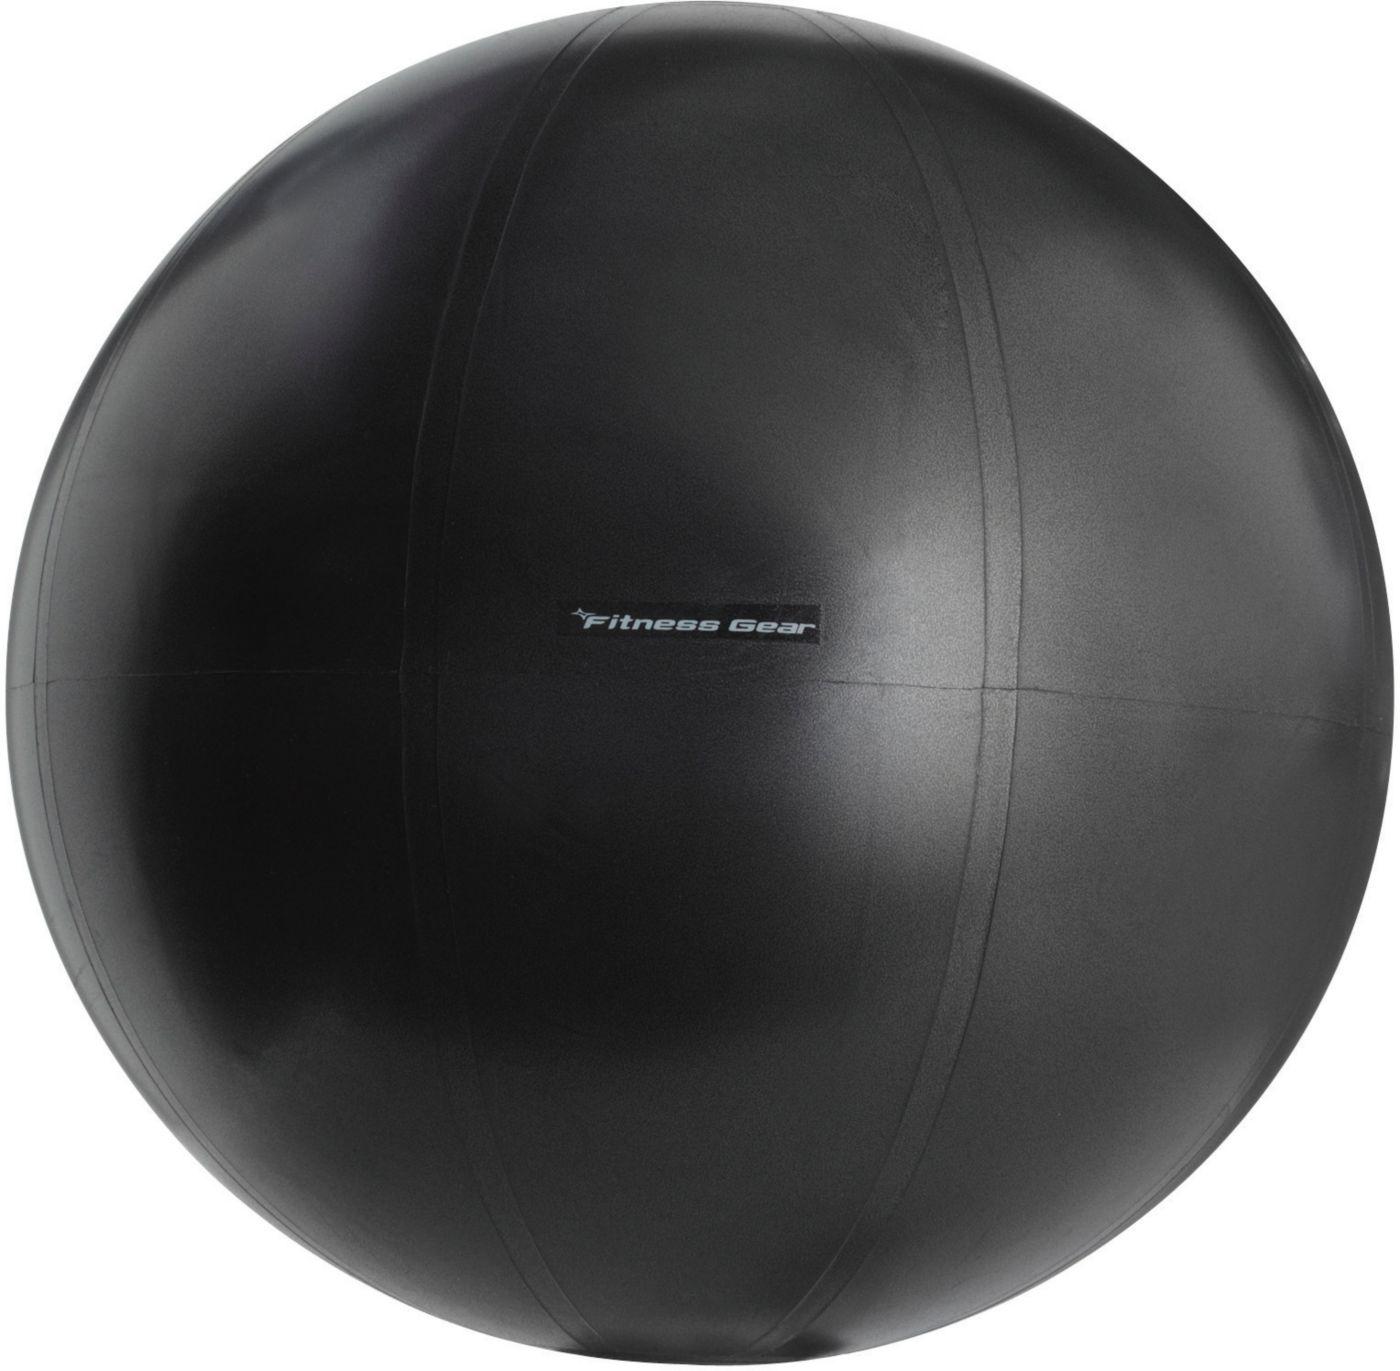 Fitness Gear 75 cm Premium Stability Ball